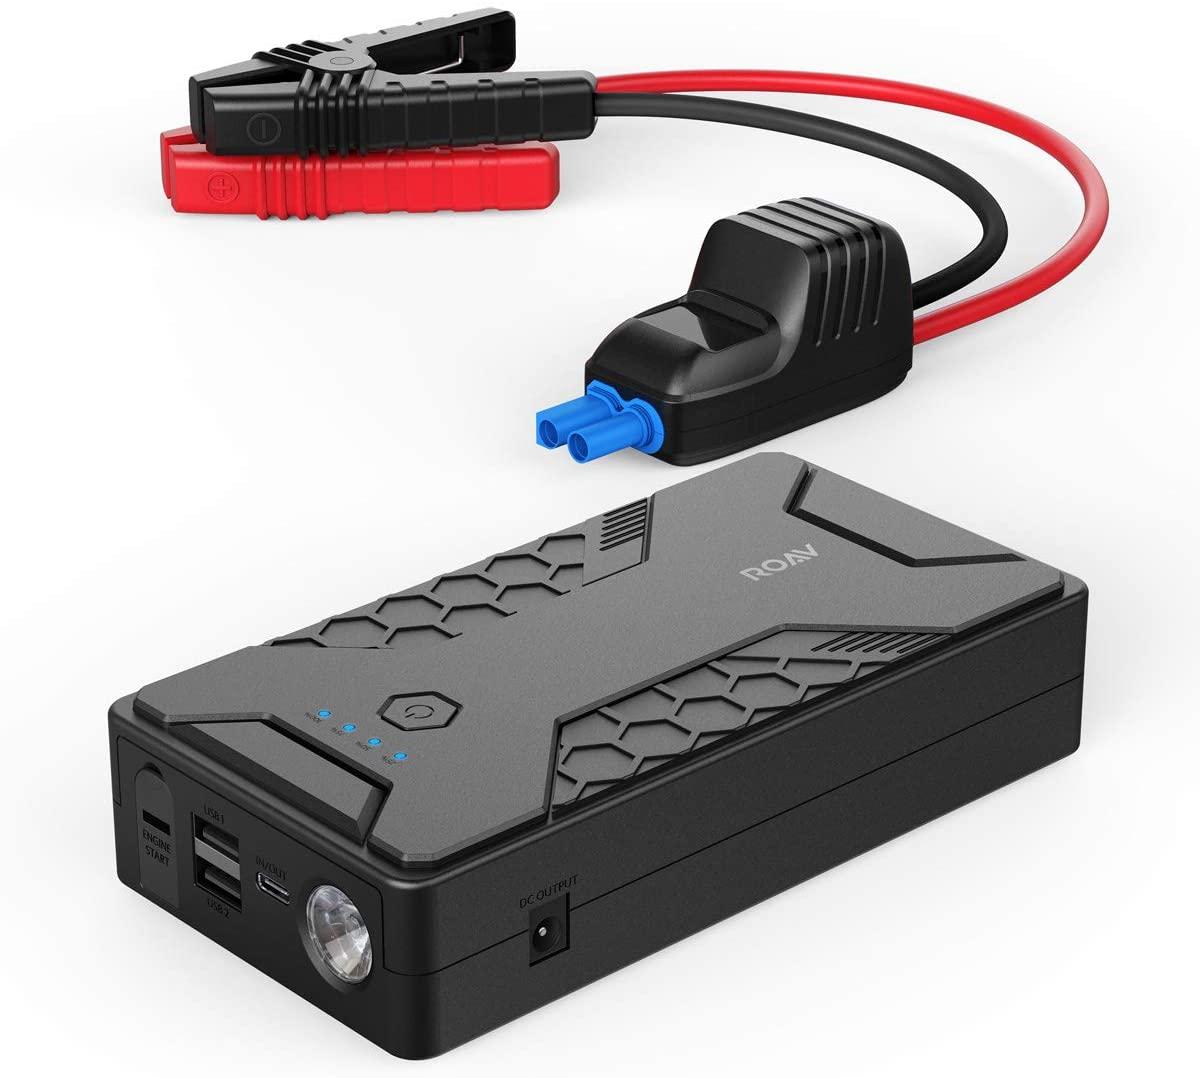 Anker ROAV Jump Starter Pro 1000A 12800mA $67.99 + FS